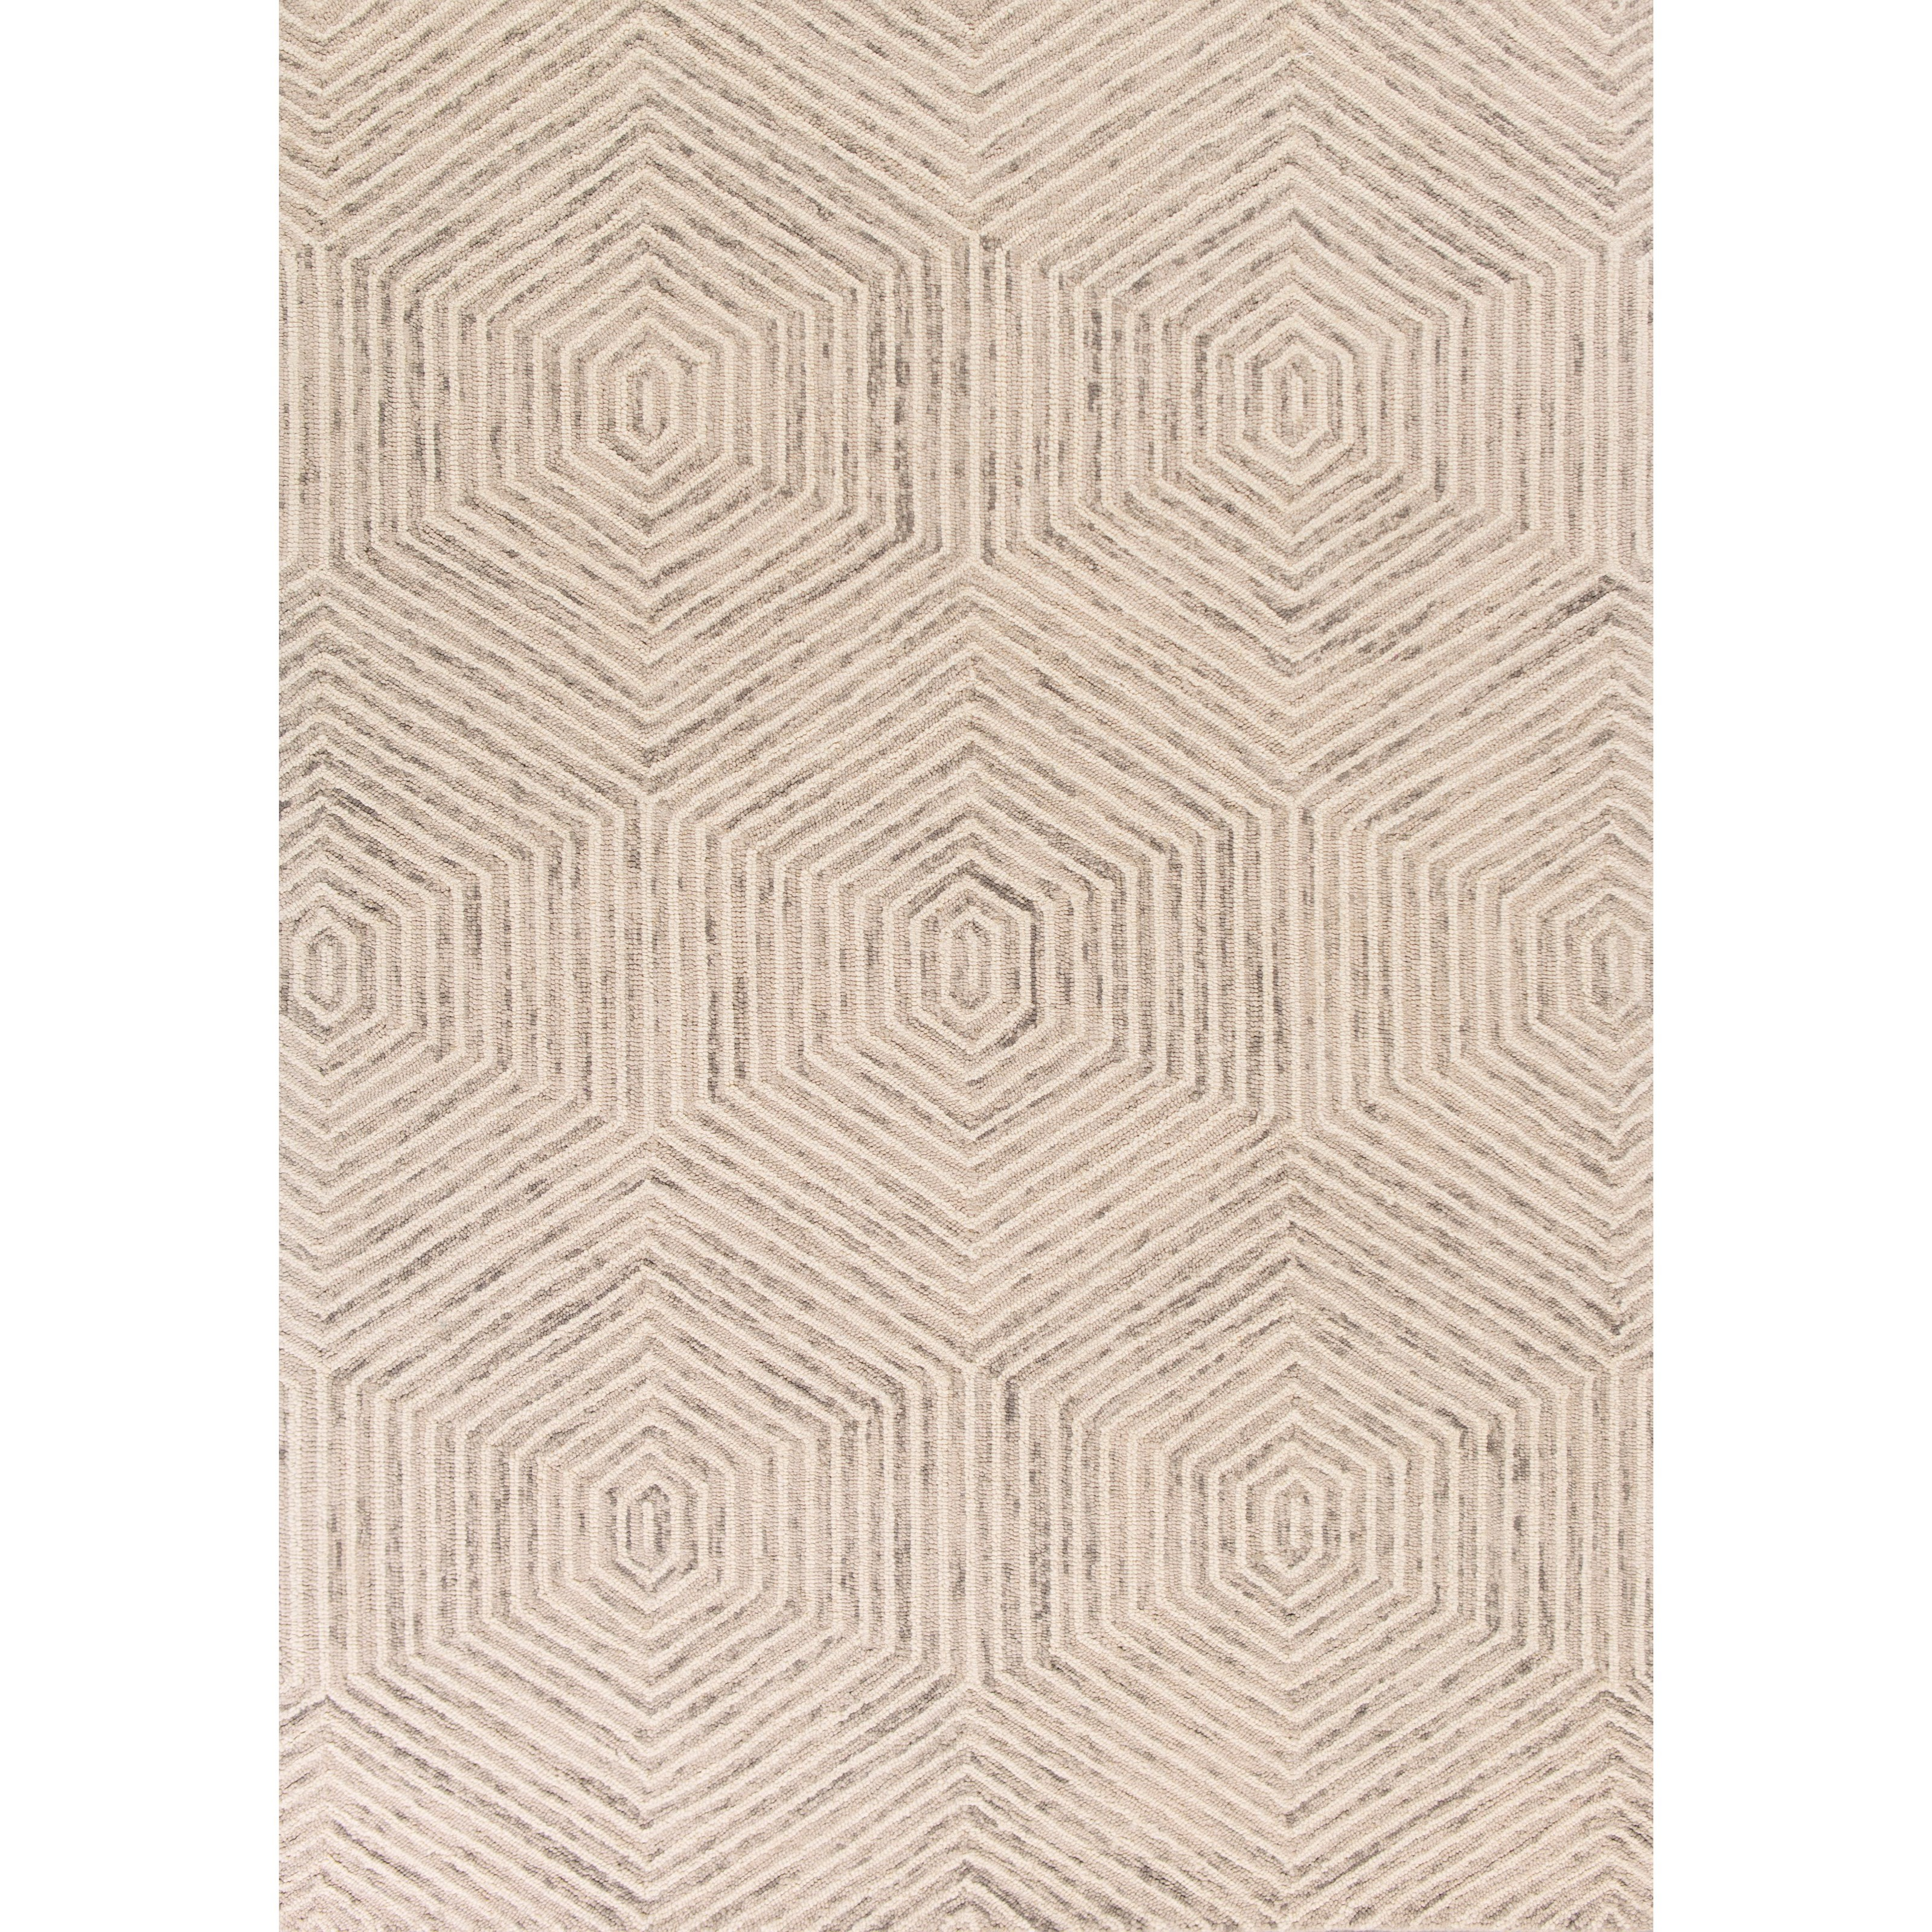 9' x 12' Ivory Honeycomb Rug